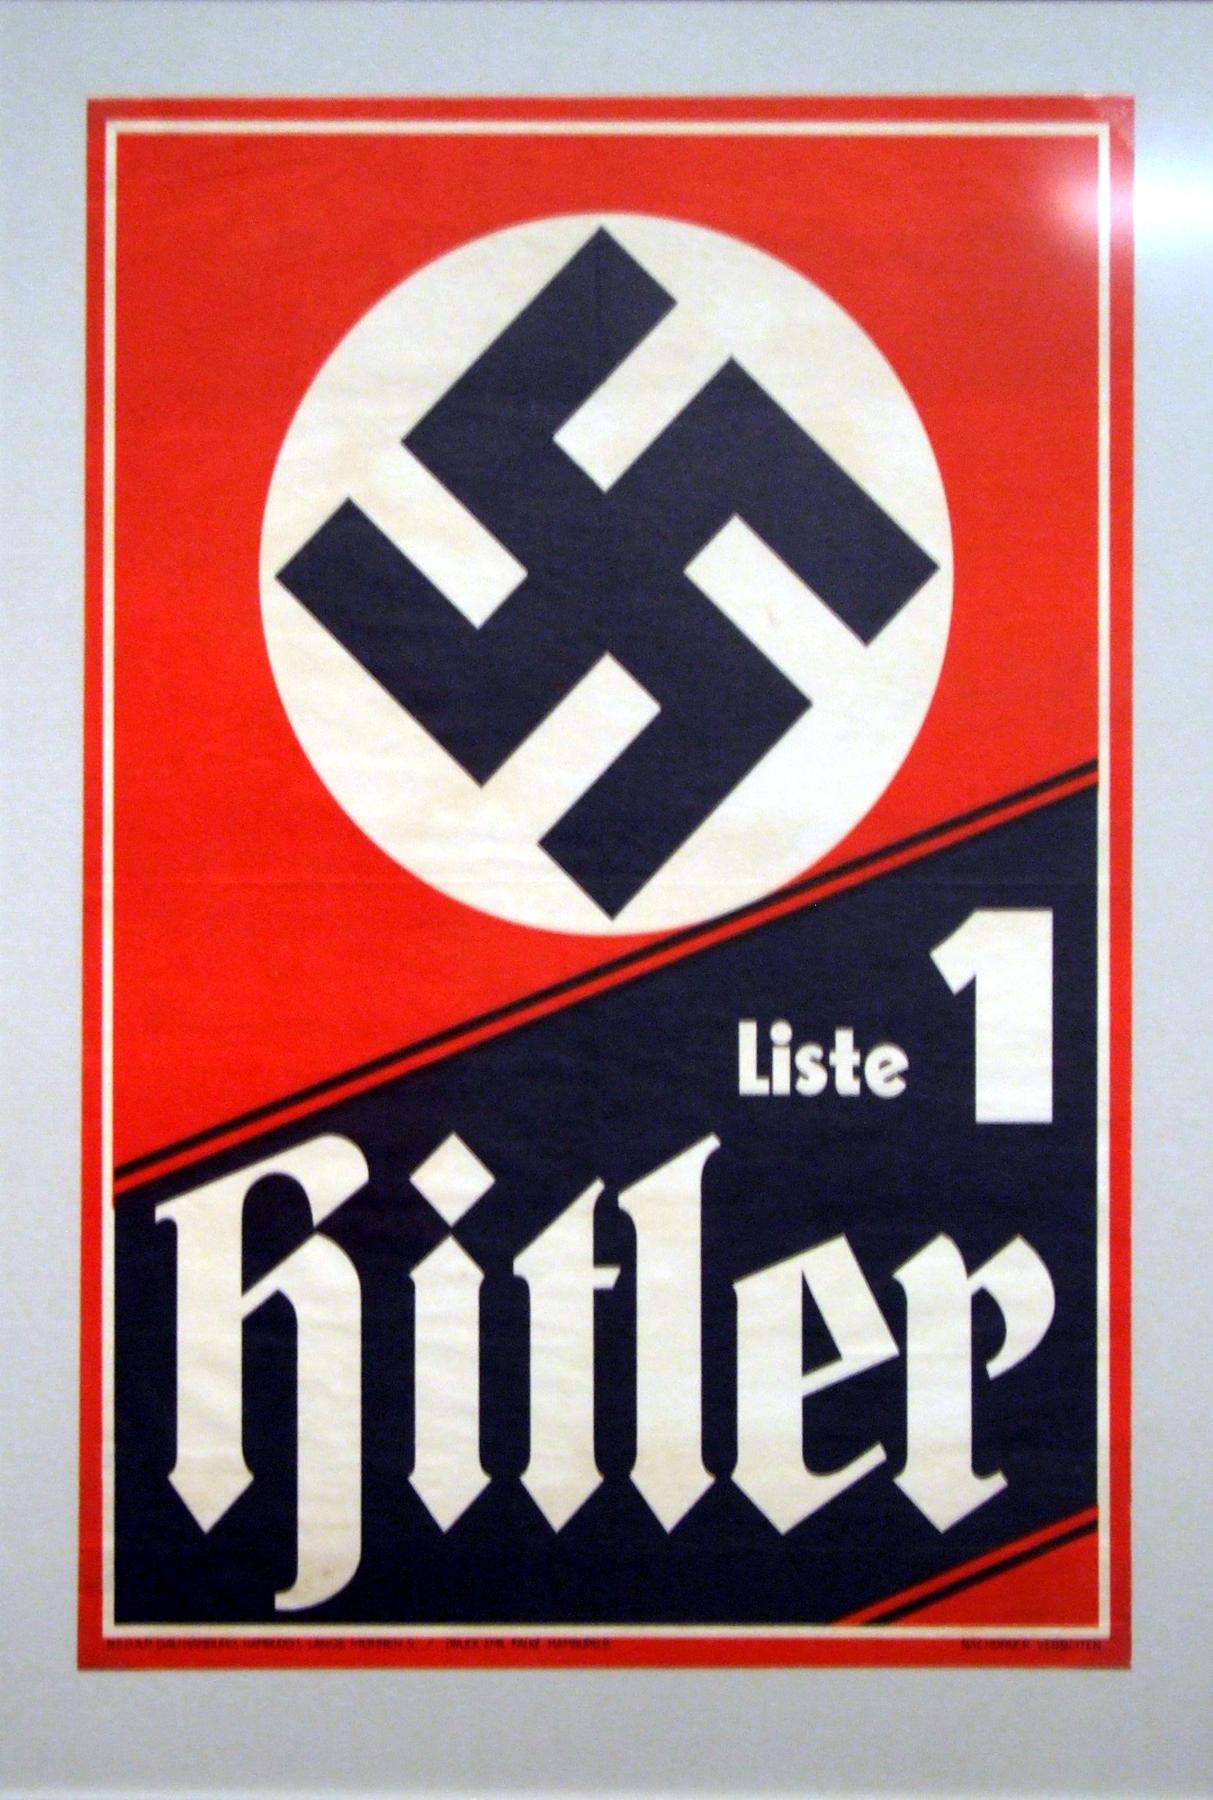 NSDAP plakat z roku 1933